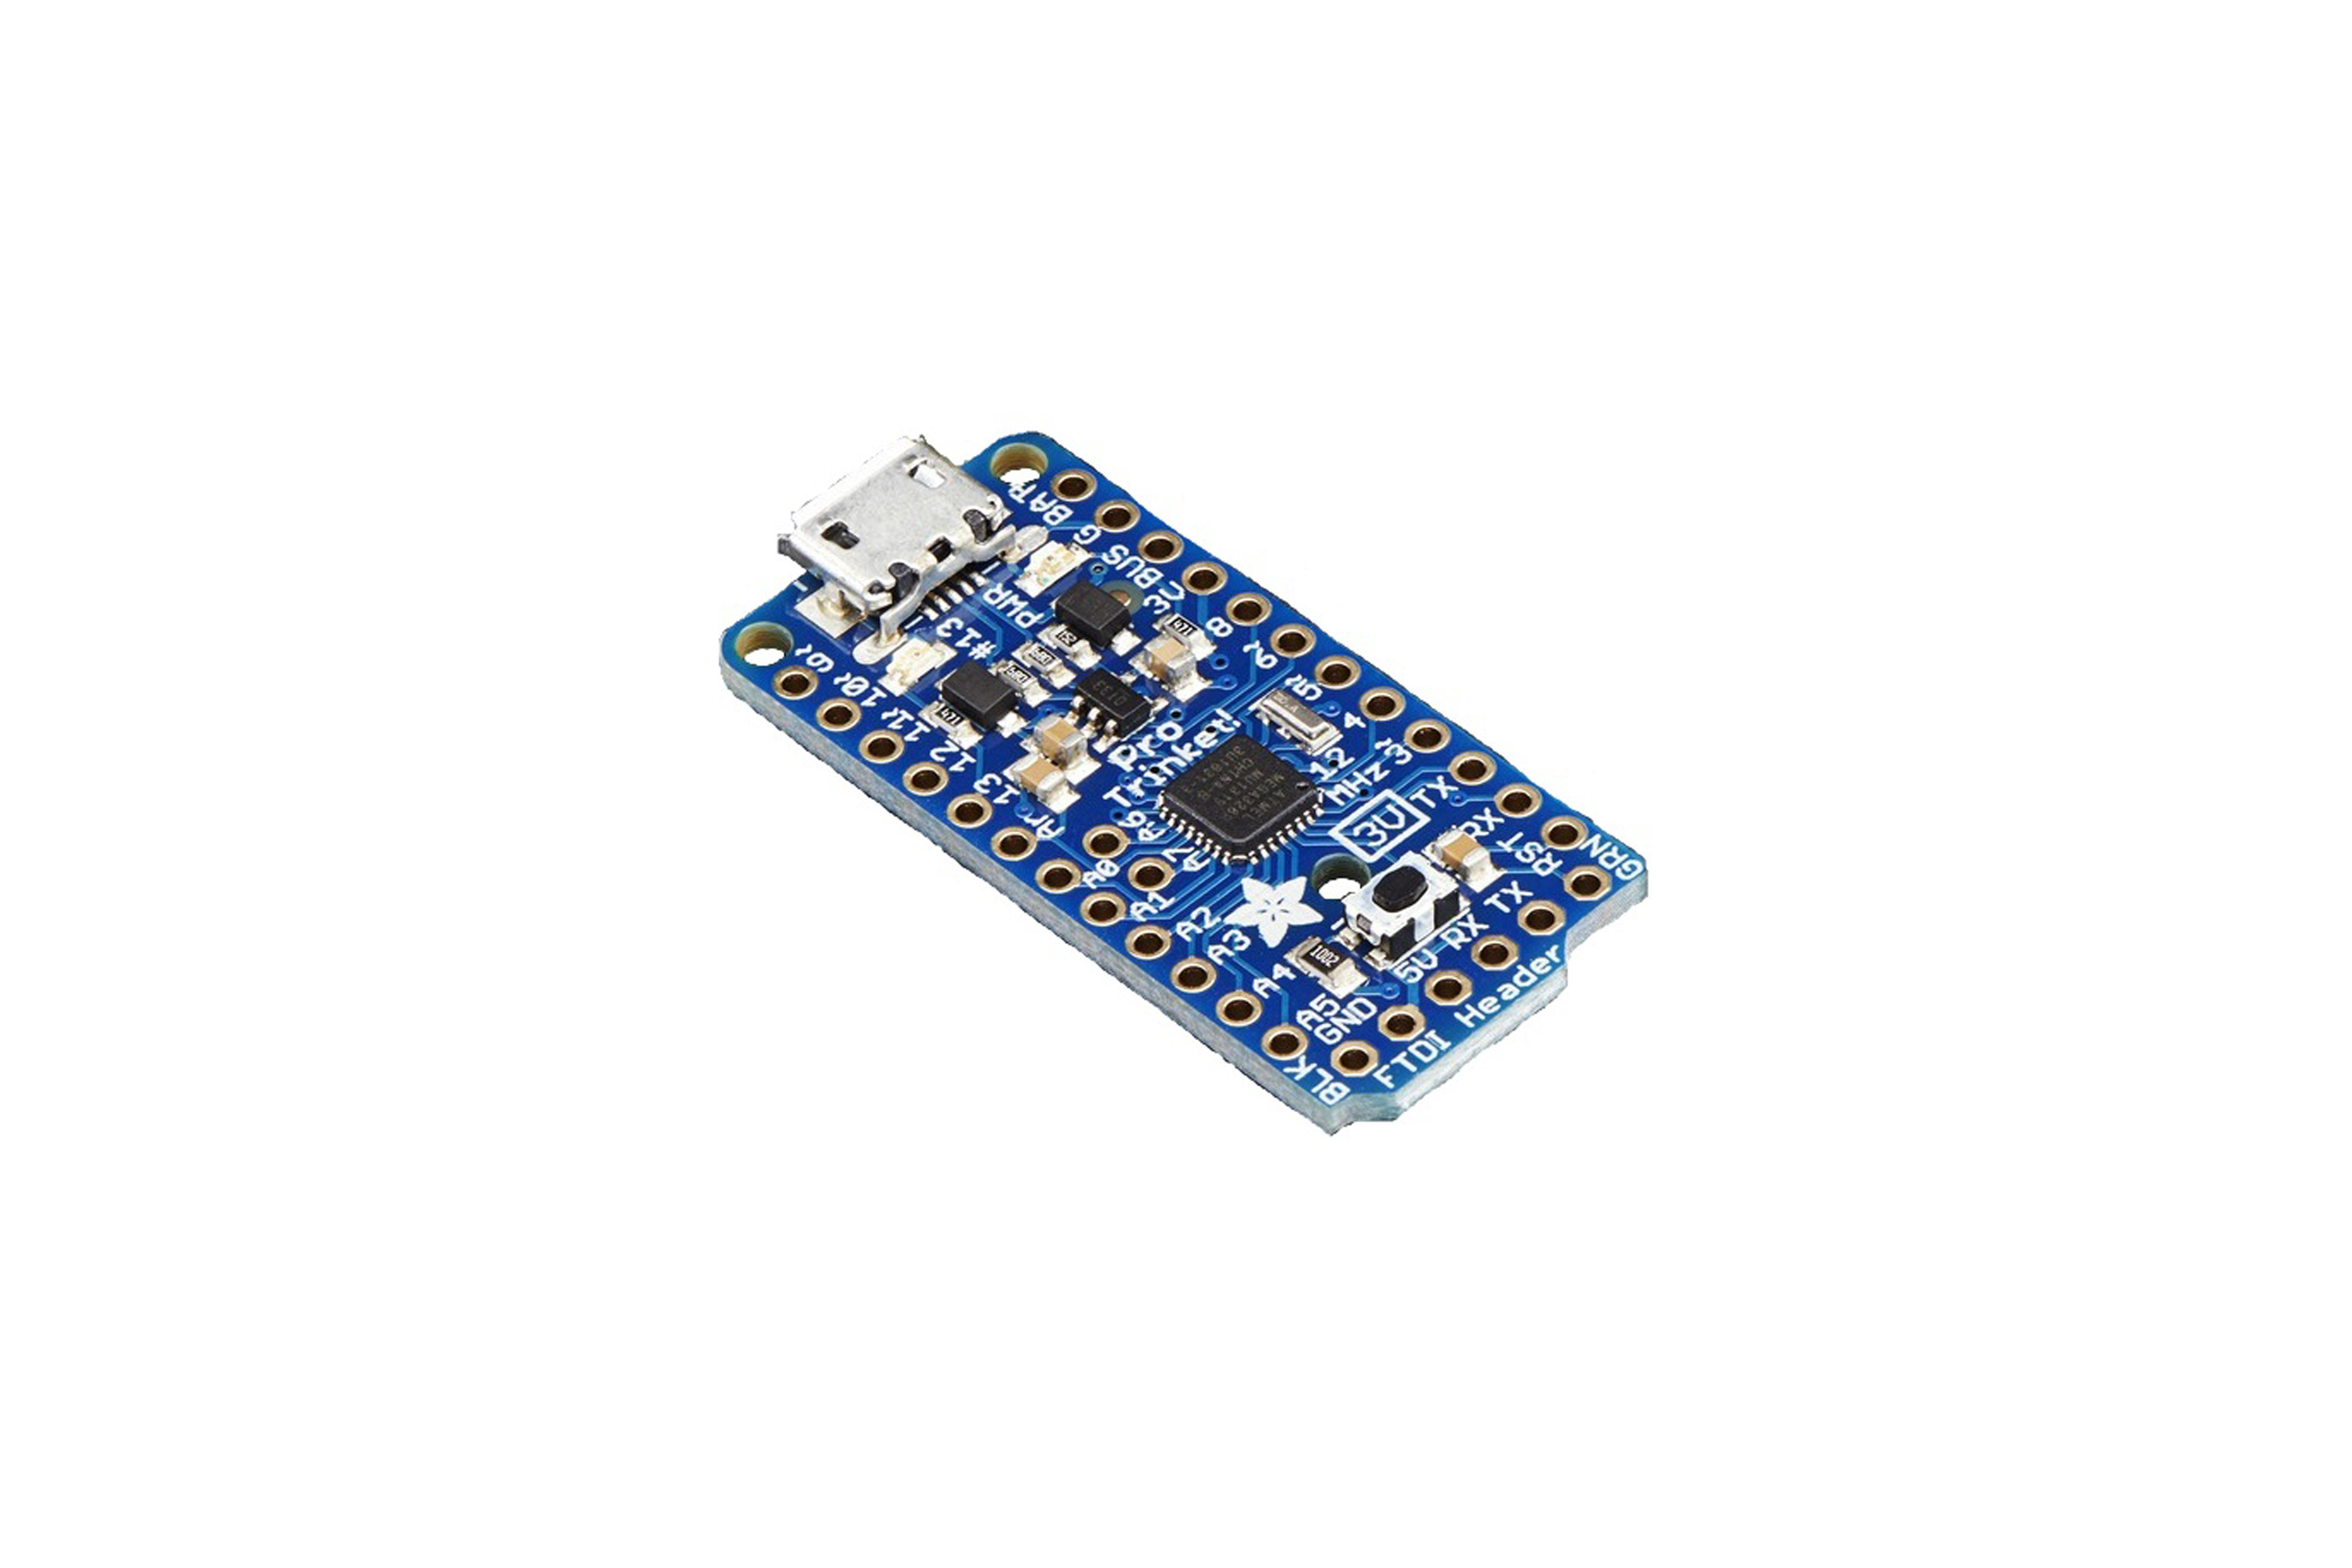 Adafruit Pro Trinket - 3 V 12 MHz